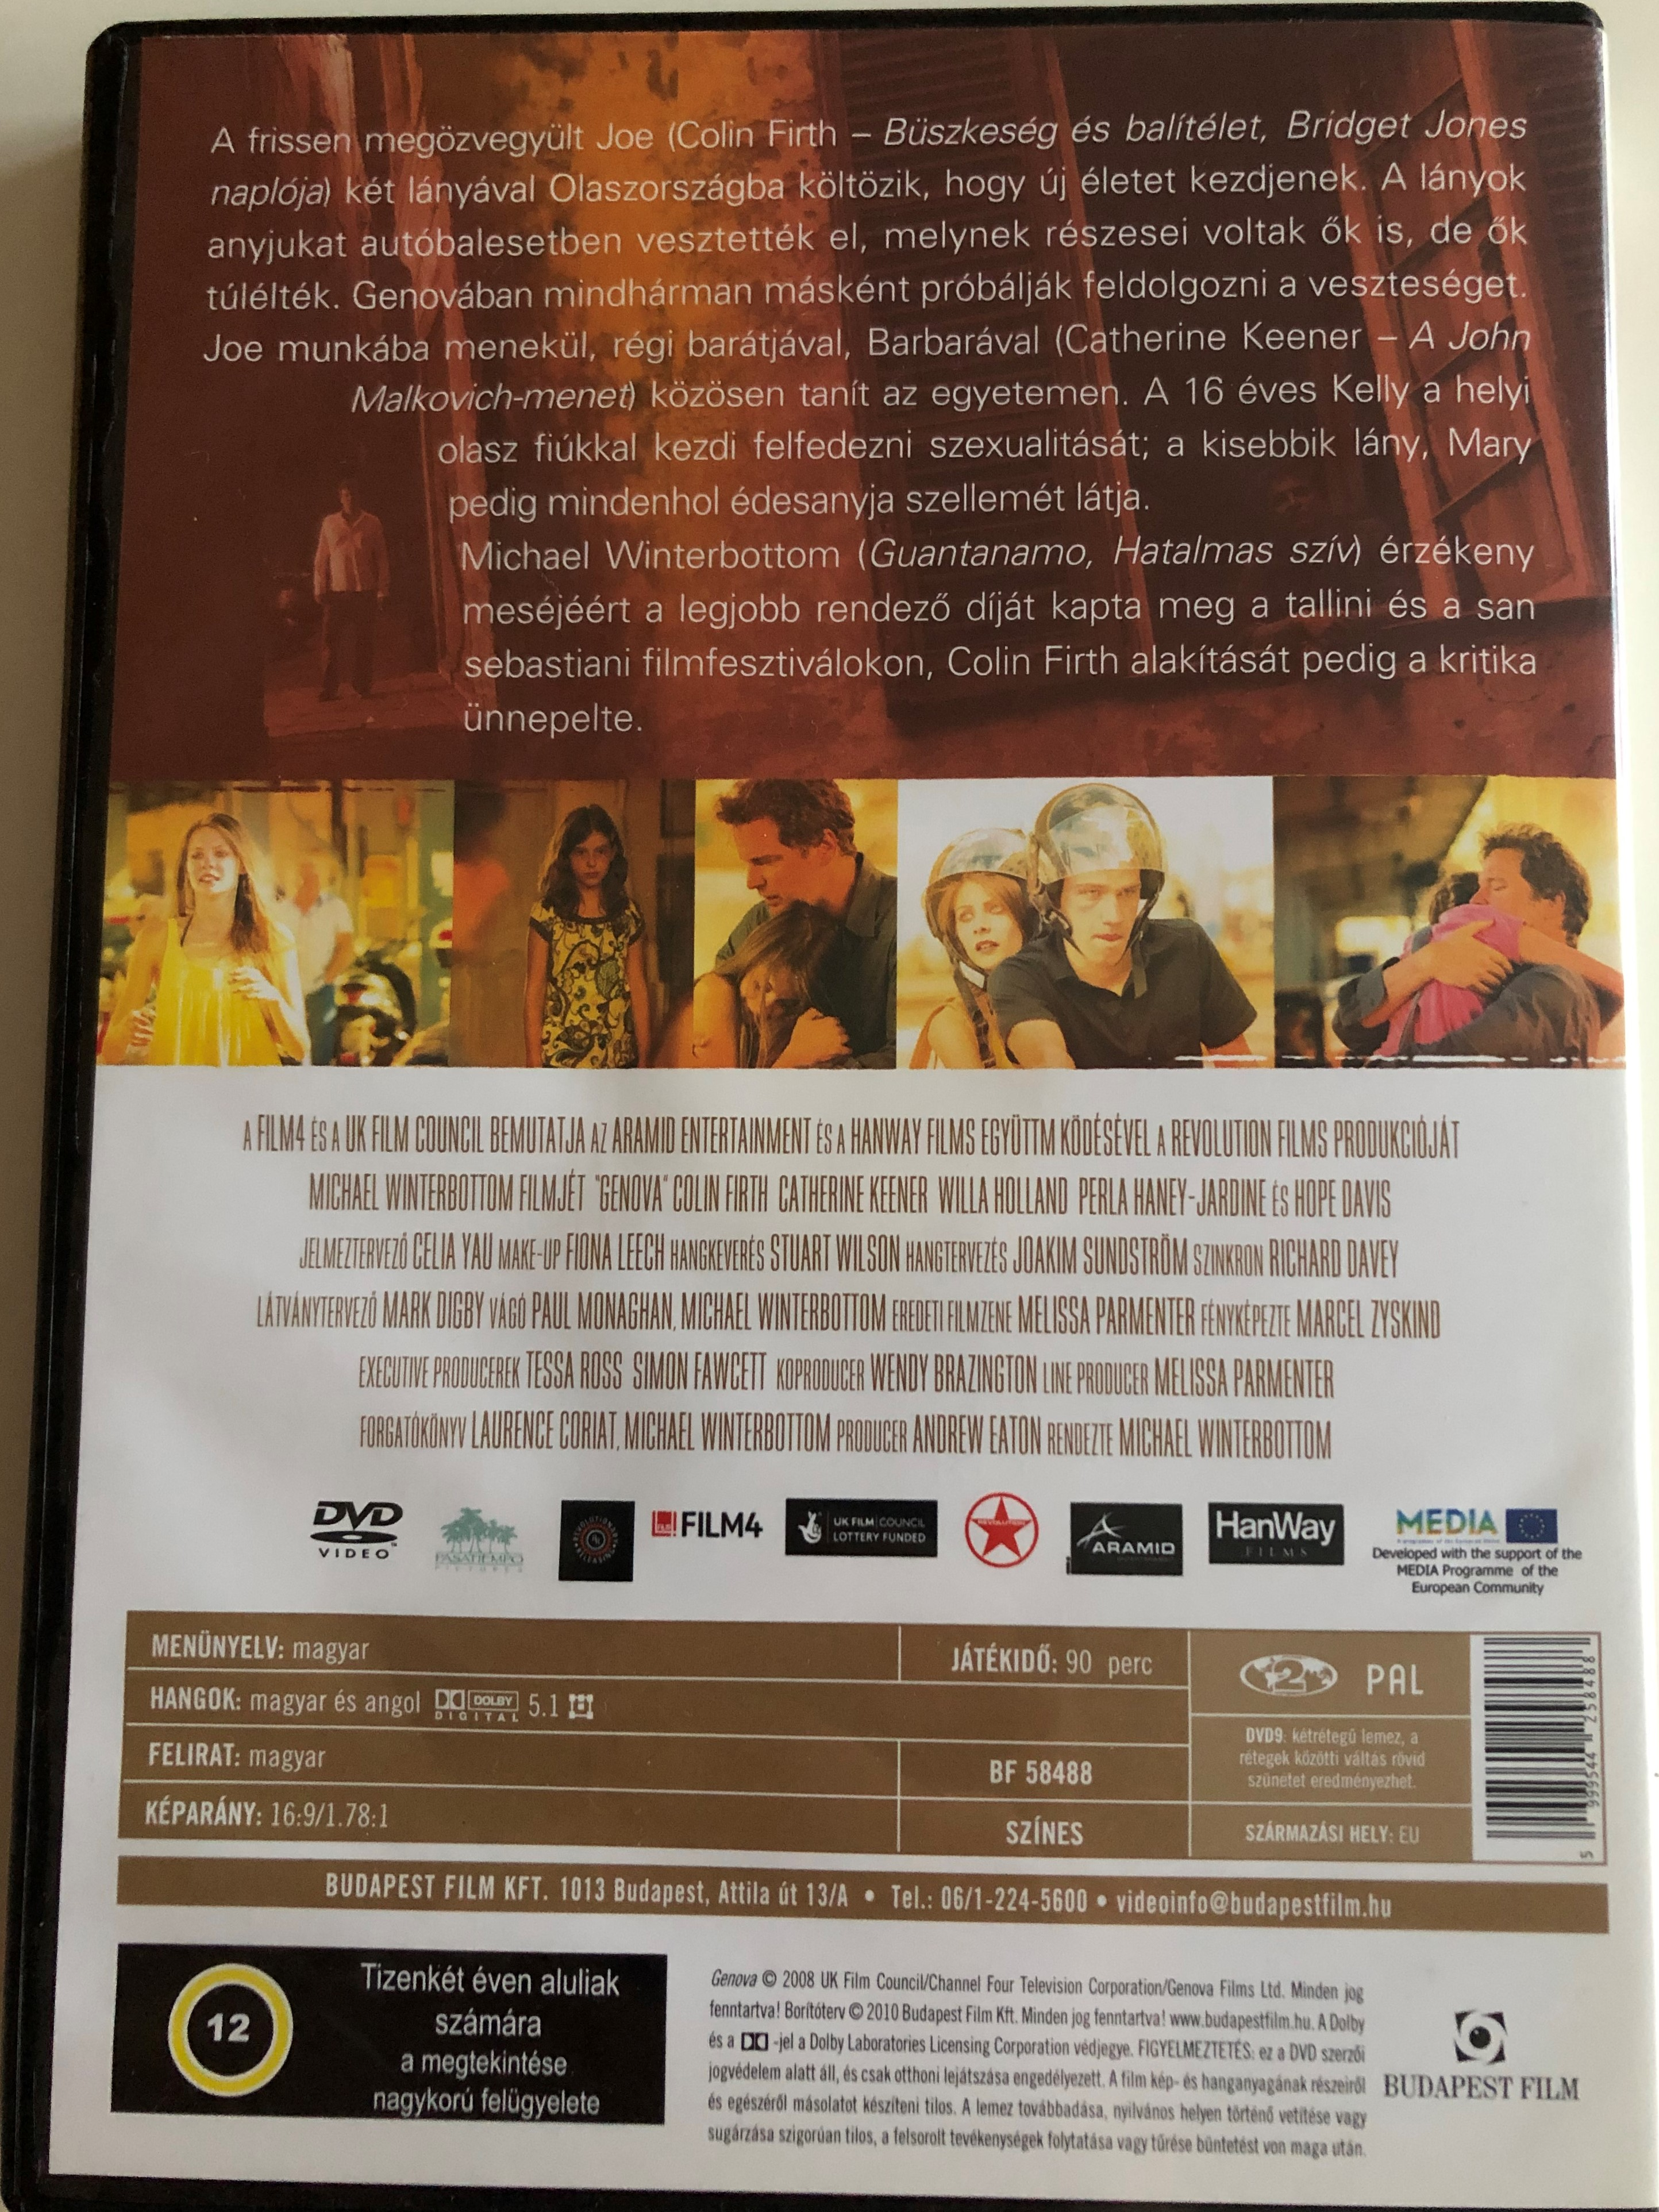 genova-dvd-2008-directed-by-michael-winterbottom-2.jpg